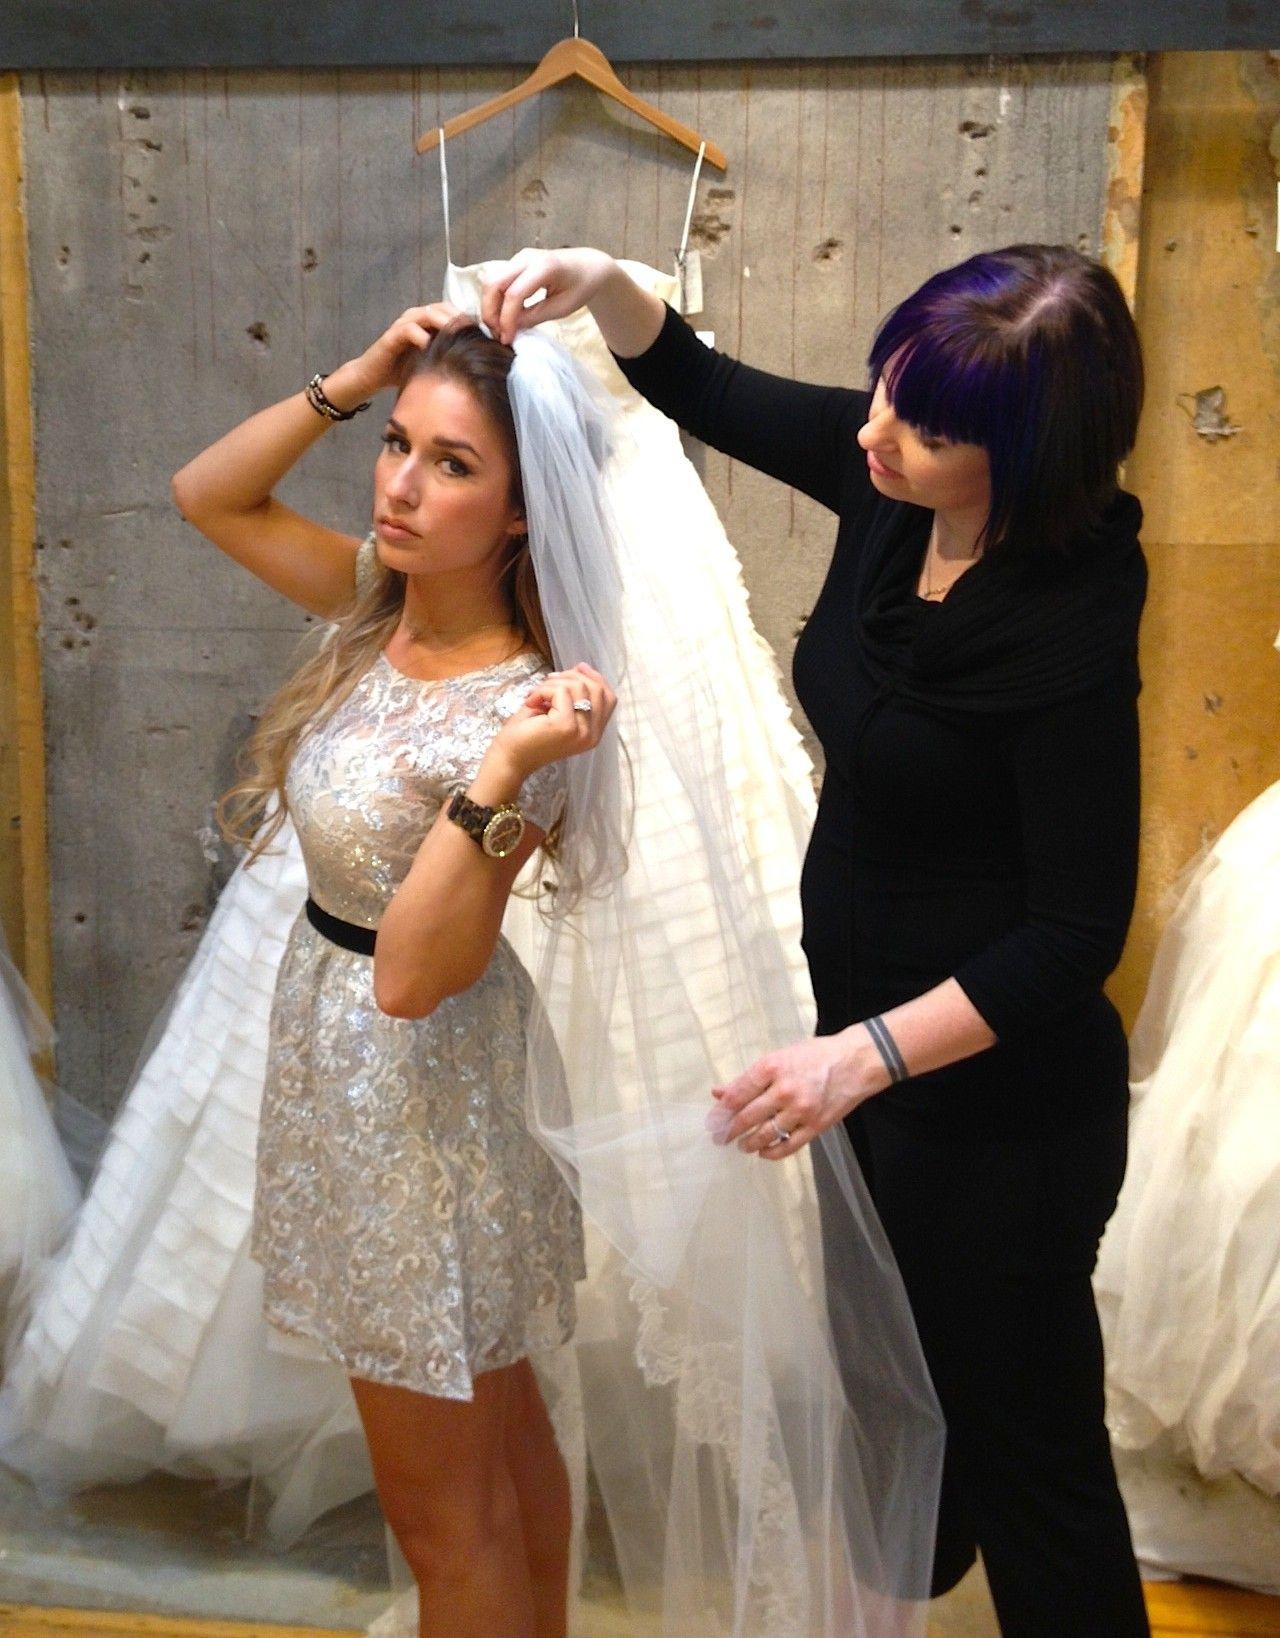 Eric Decker Of Broncos Singer Jessie James Plan Wedding In Colorado